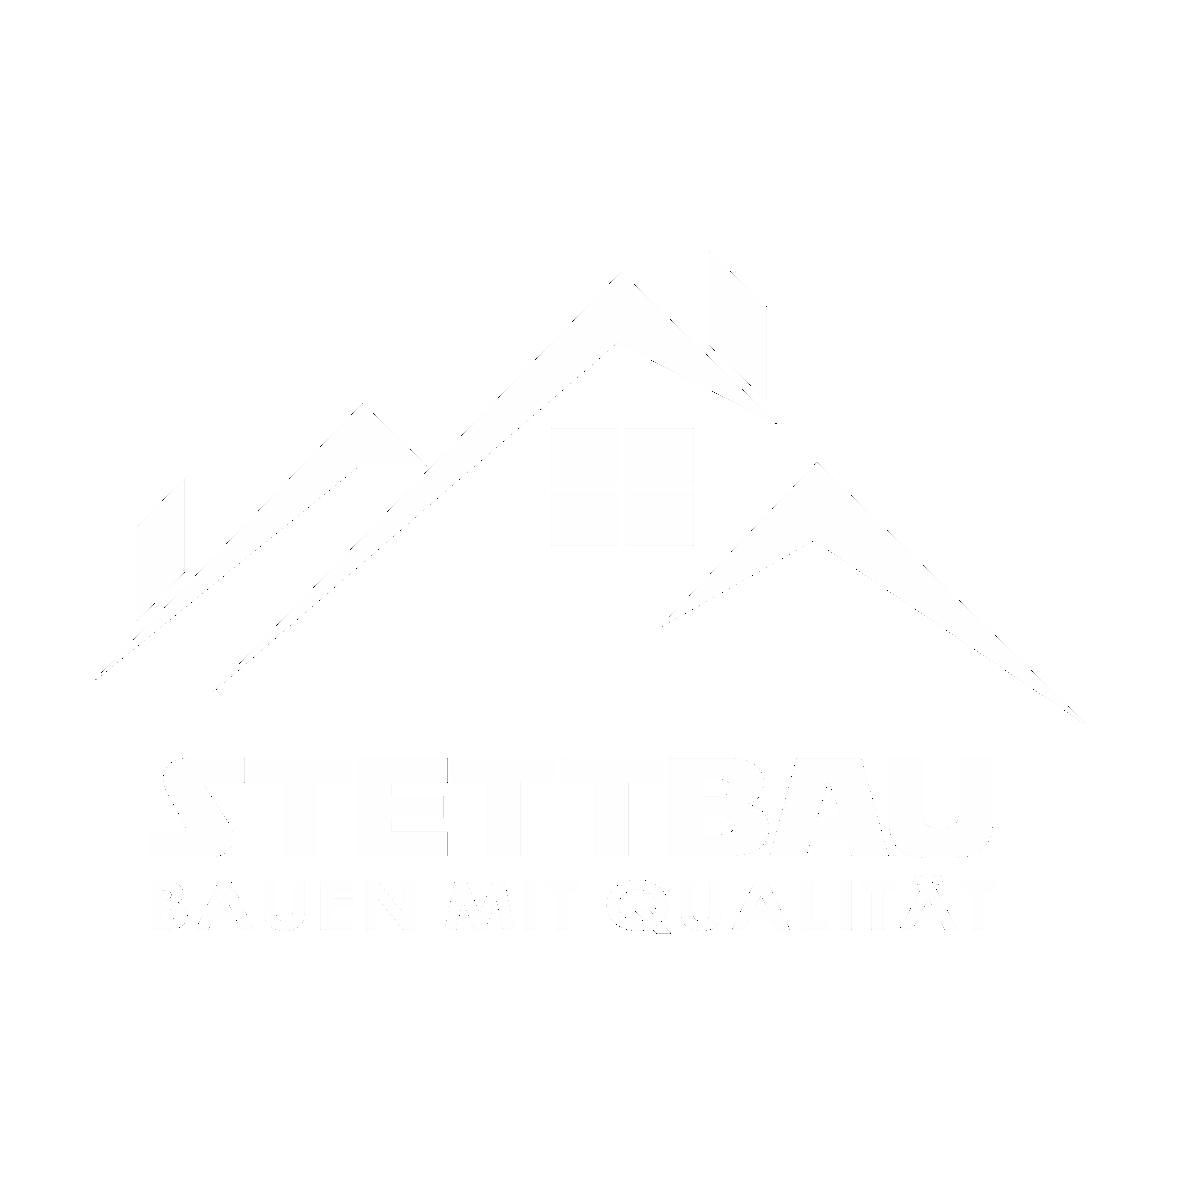 stettbau.png